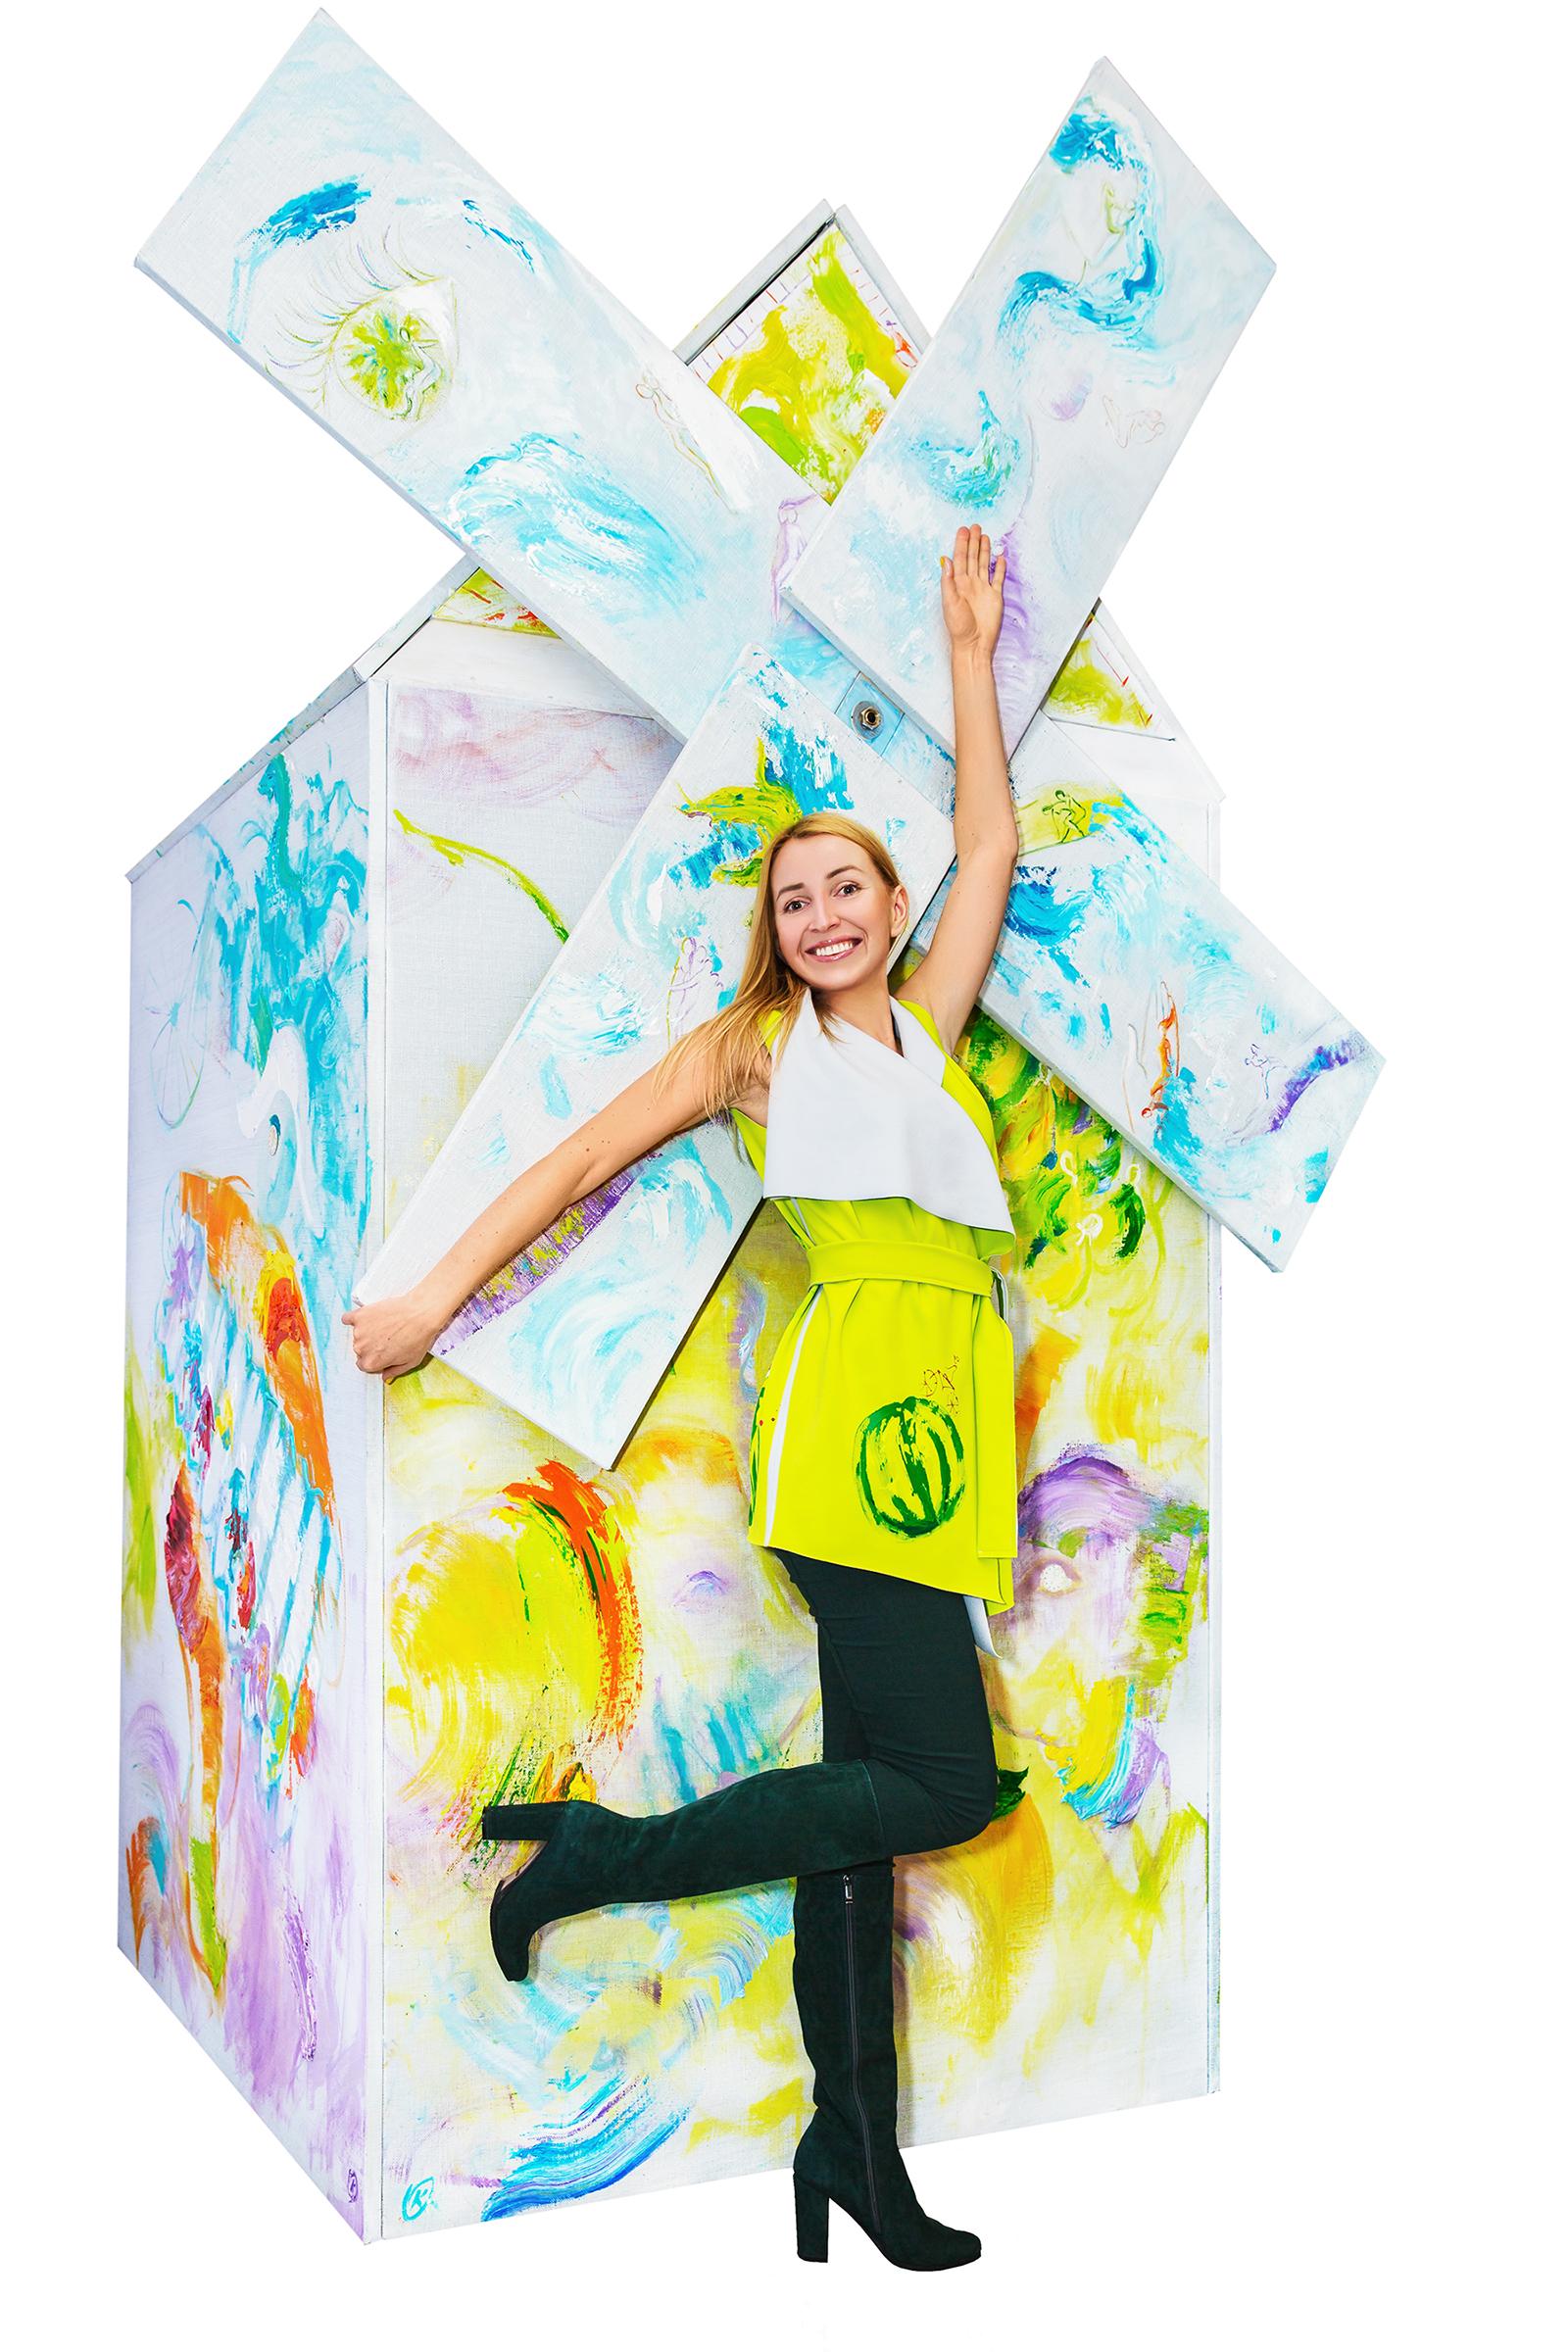 Olga Kosheleva Windmill of love 2016